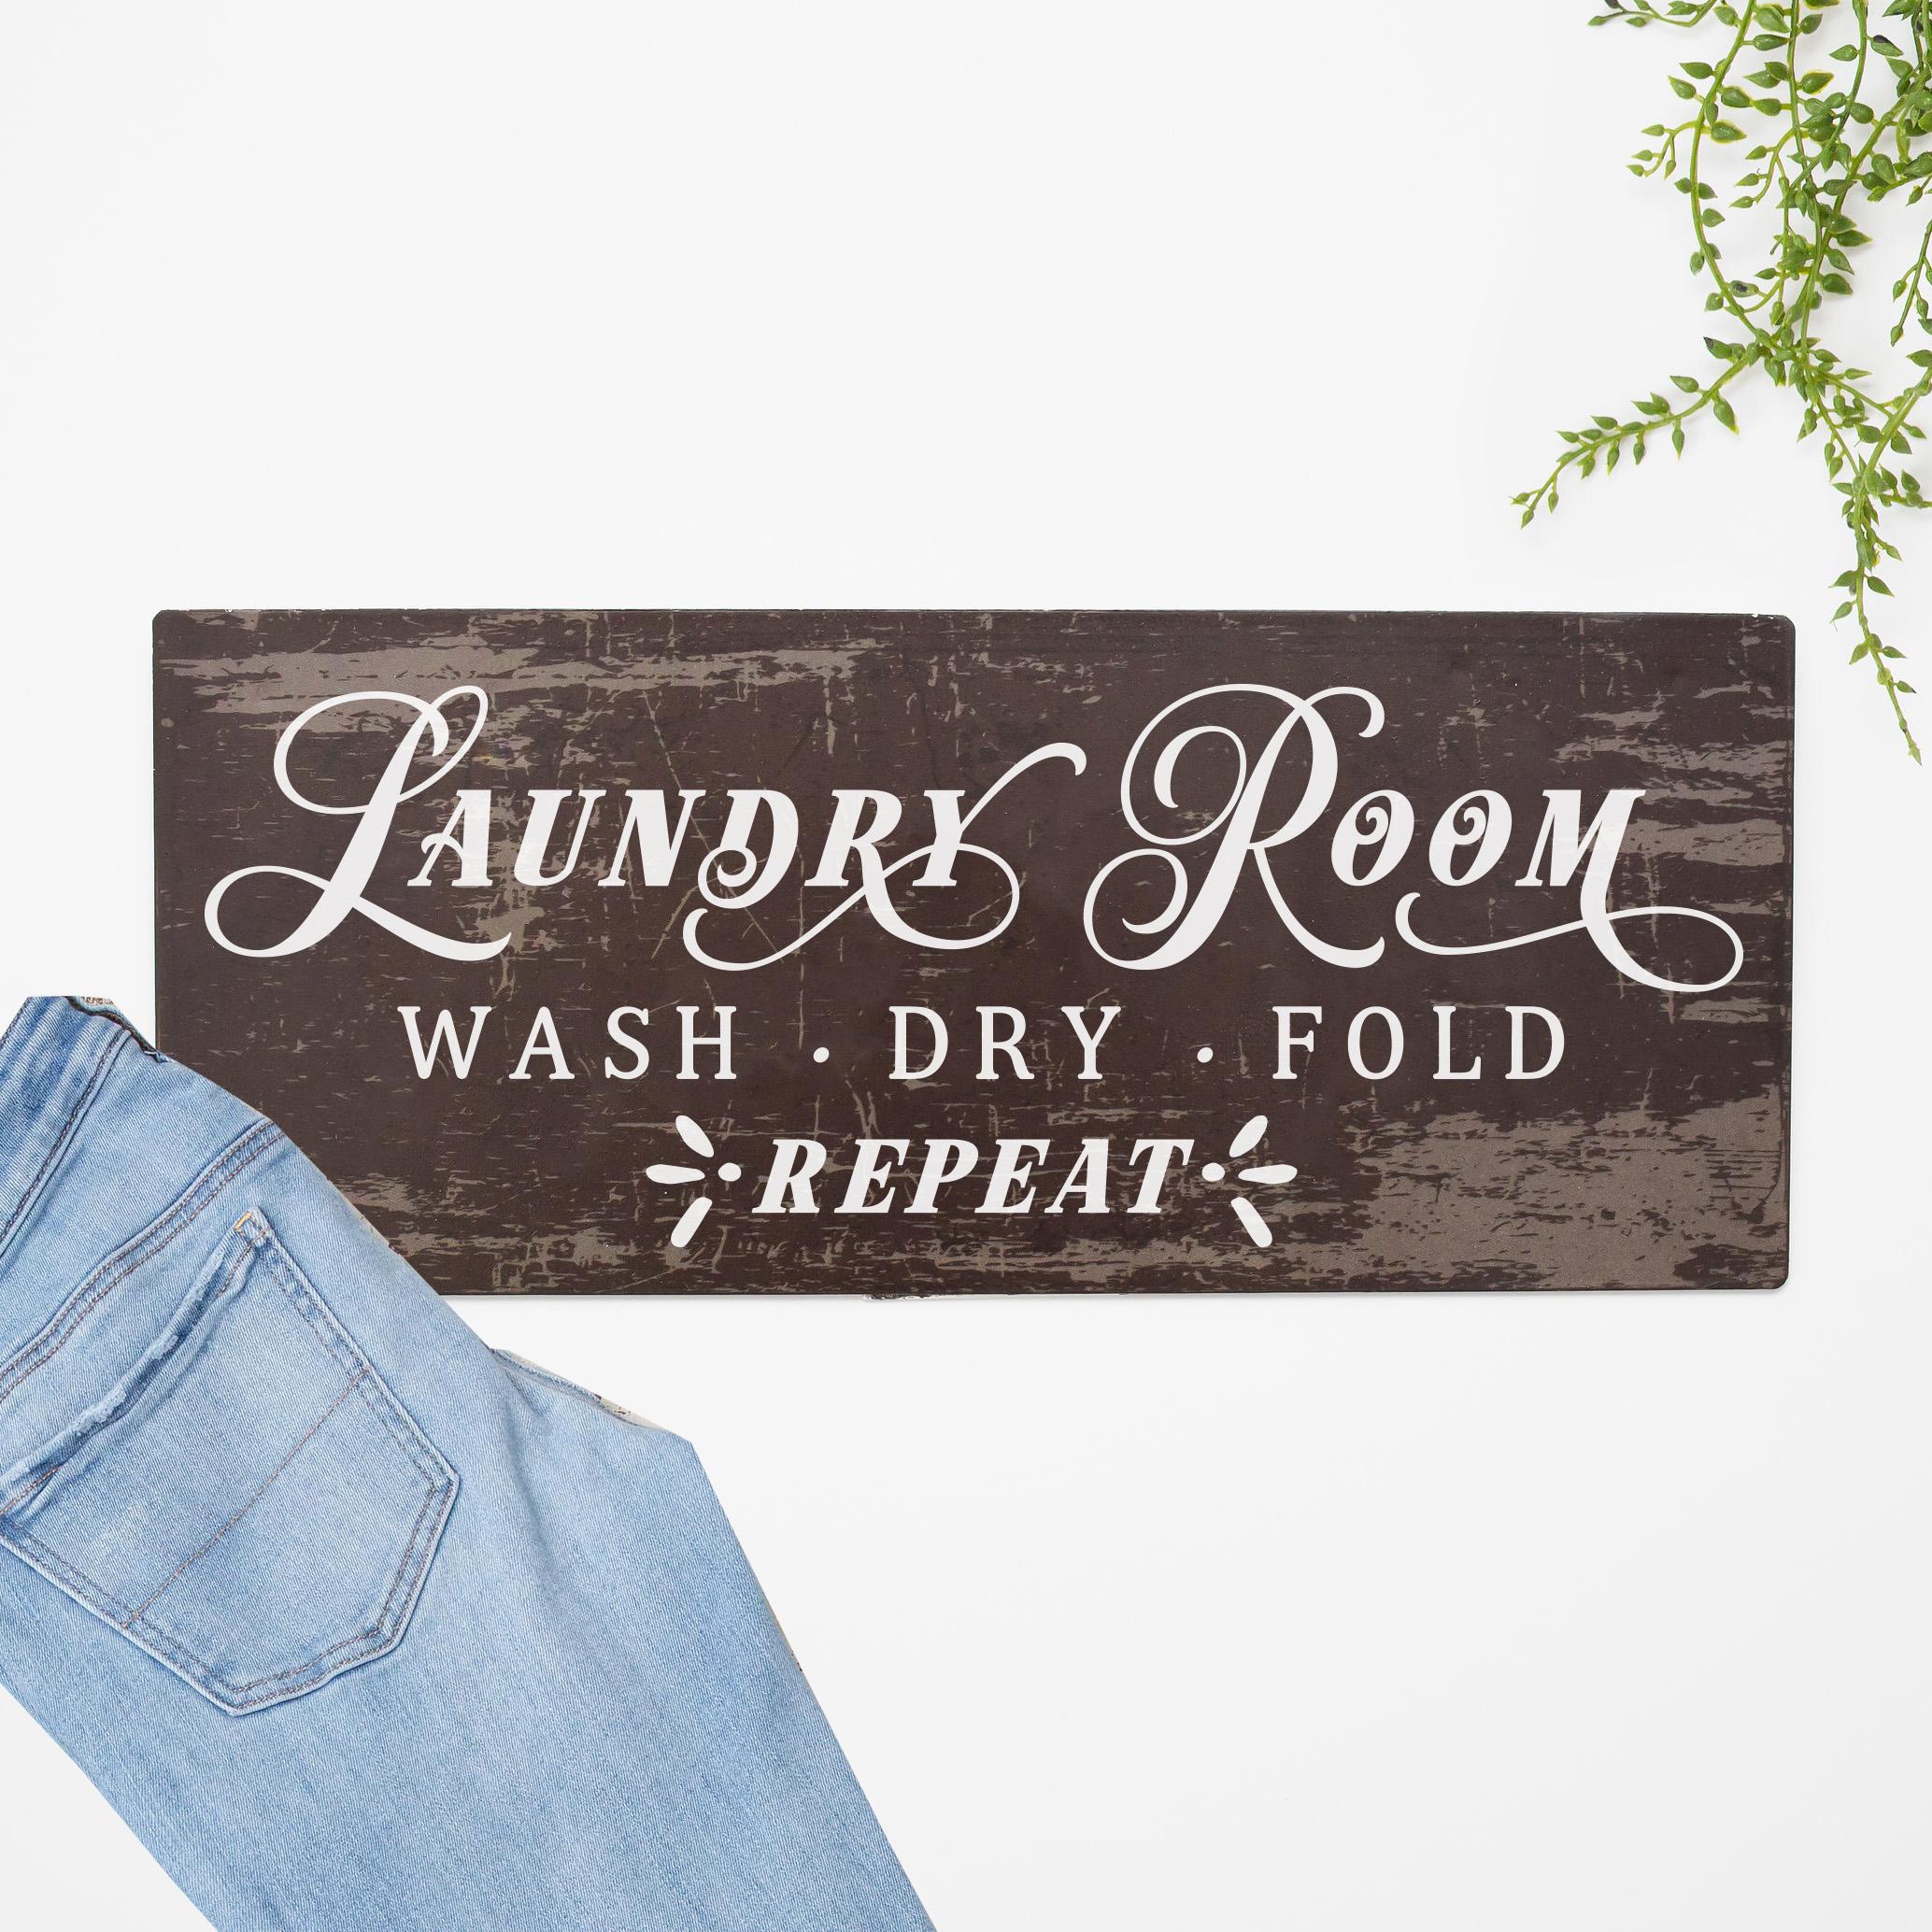 laundry room sign mockup.jpg